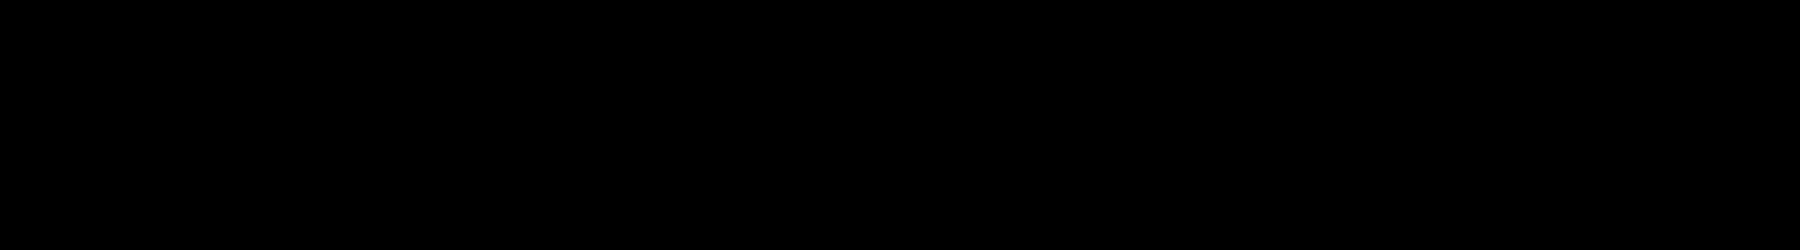 07-clavis-david.jpg